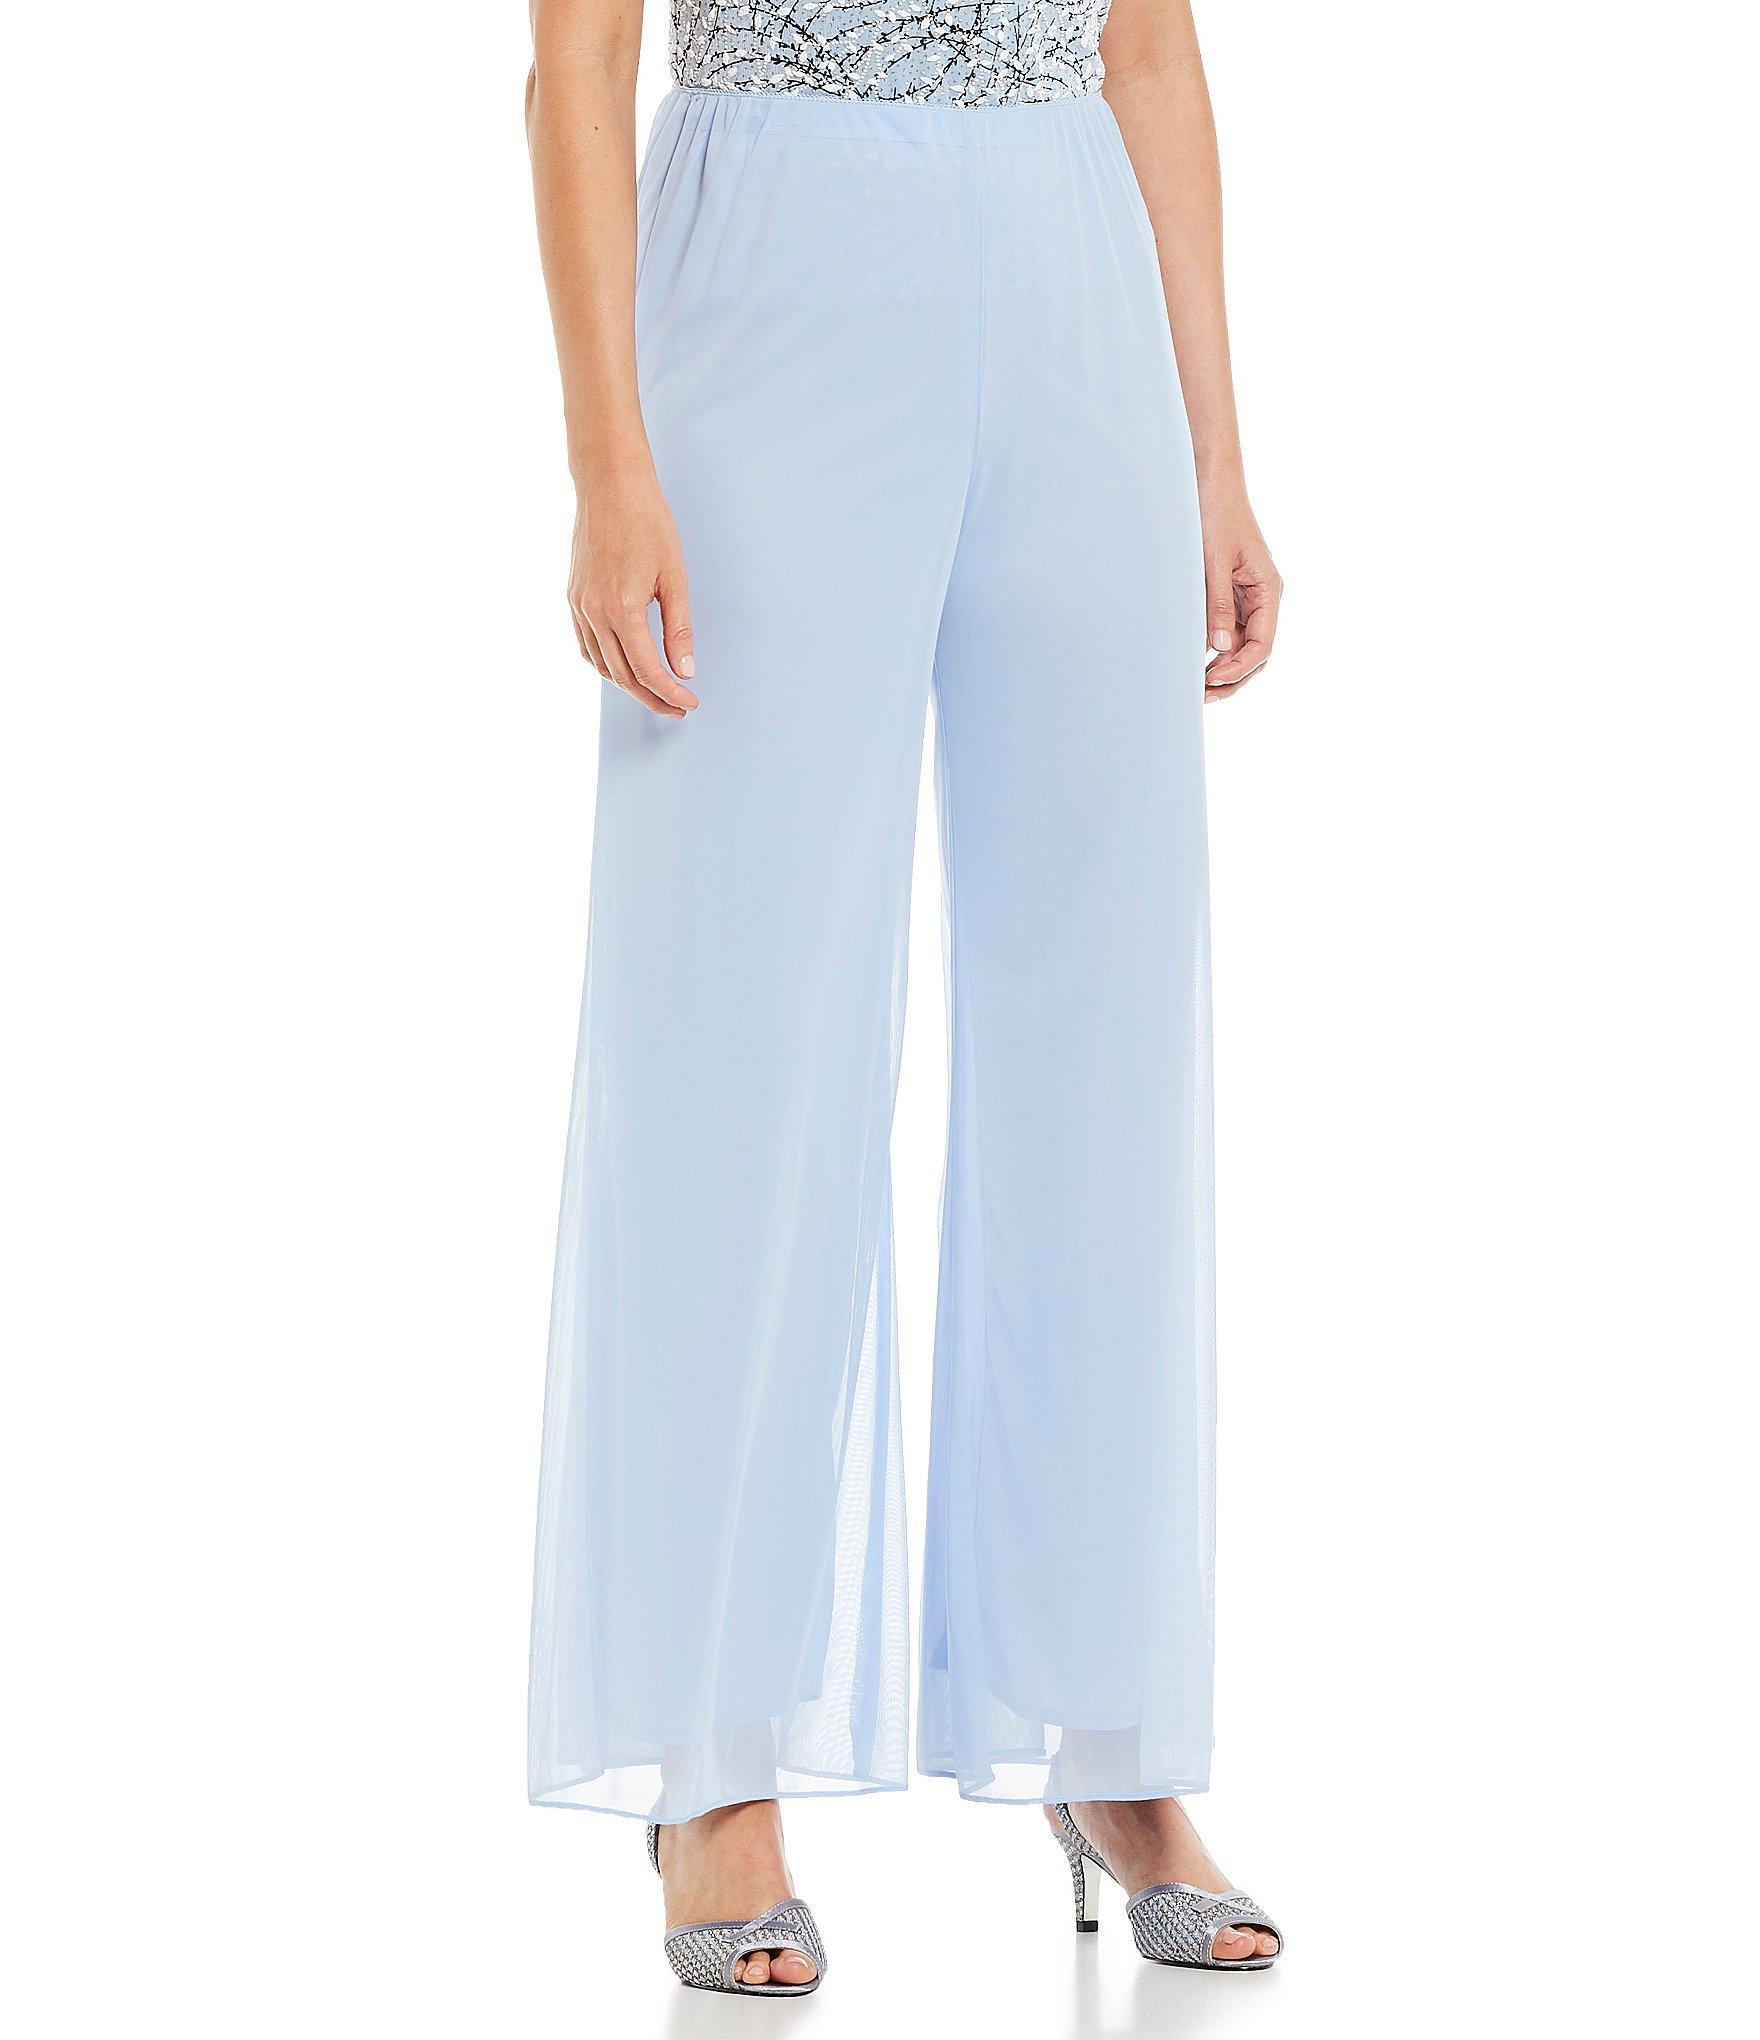 00e44f816f2 Lyst - Alex Evenings Chiffon Mesh Wide Leg Pants in Blue